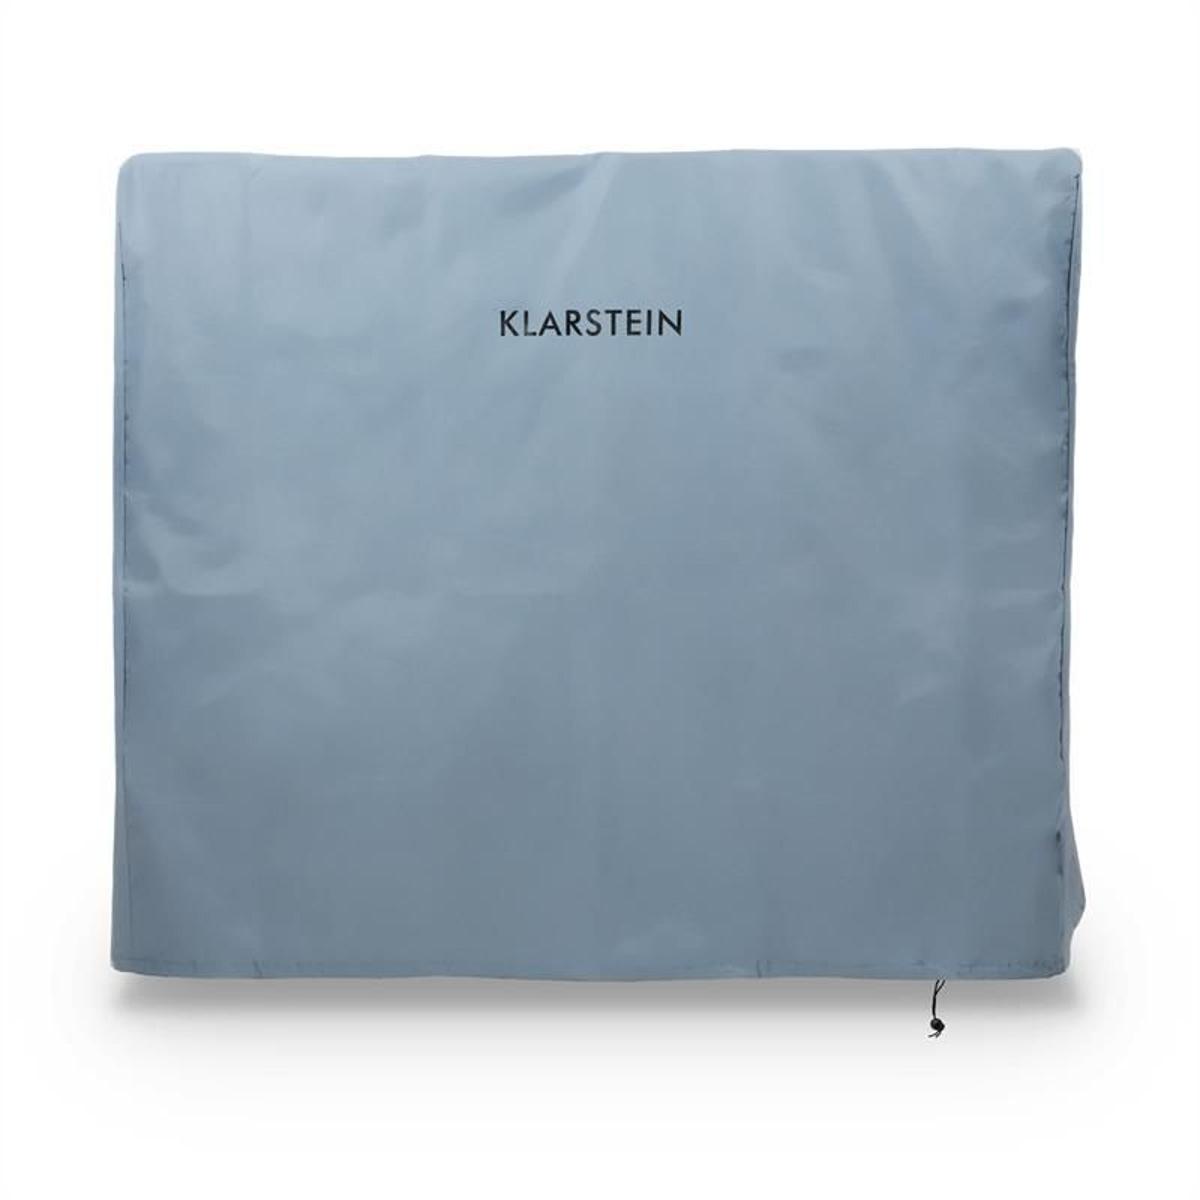 Klarstein Protector 124 Housse de protection barbecue 51x104x124cm + sac